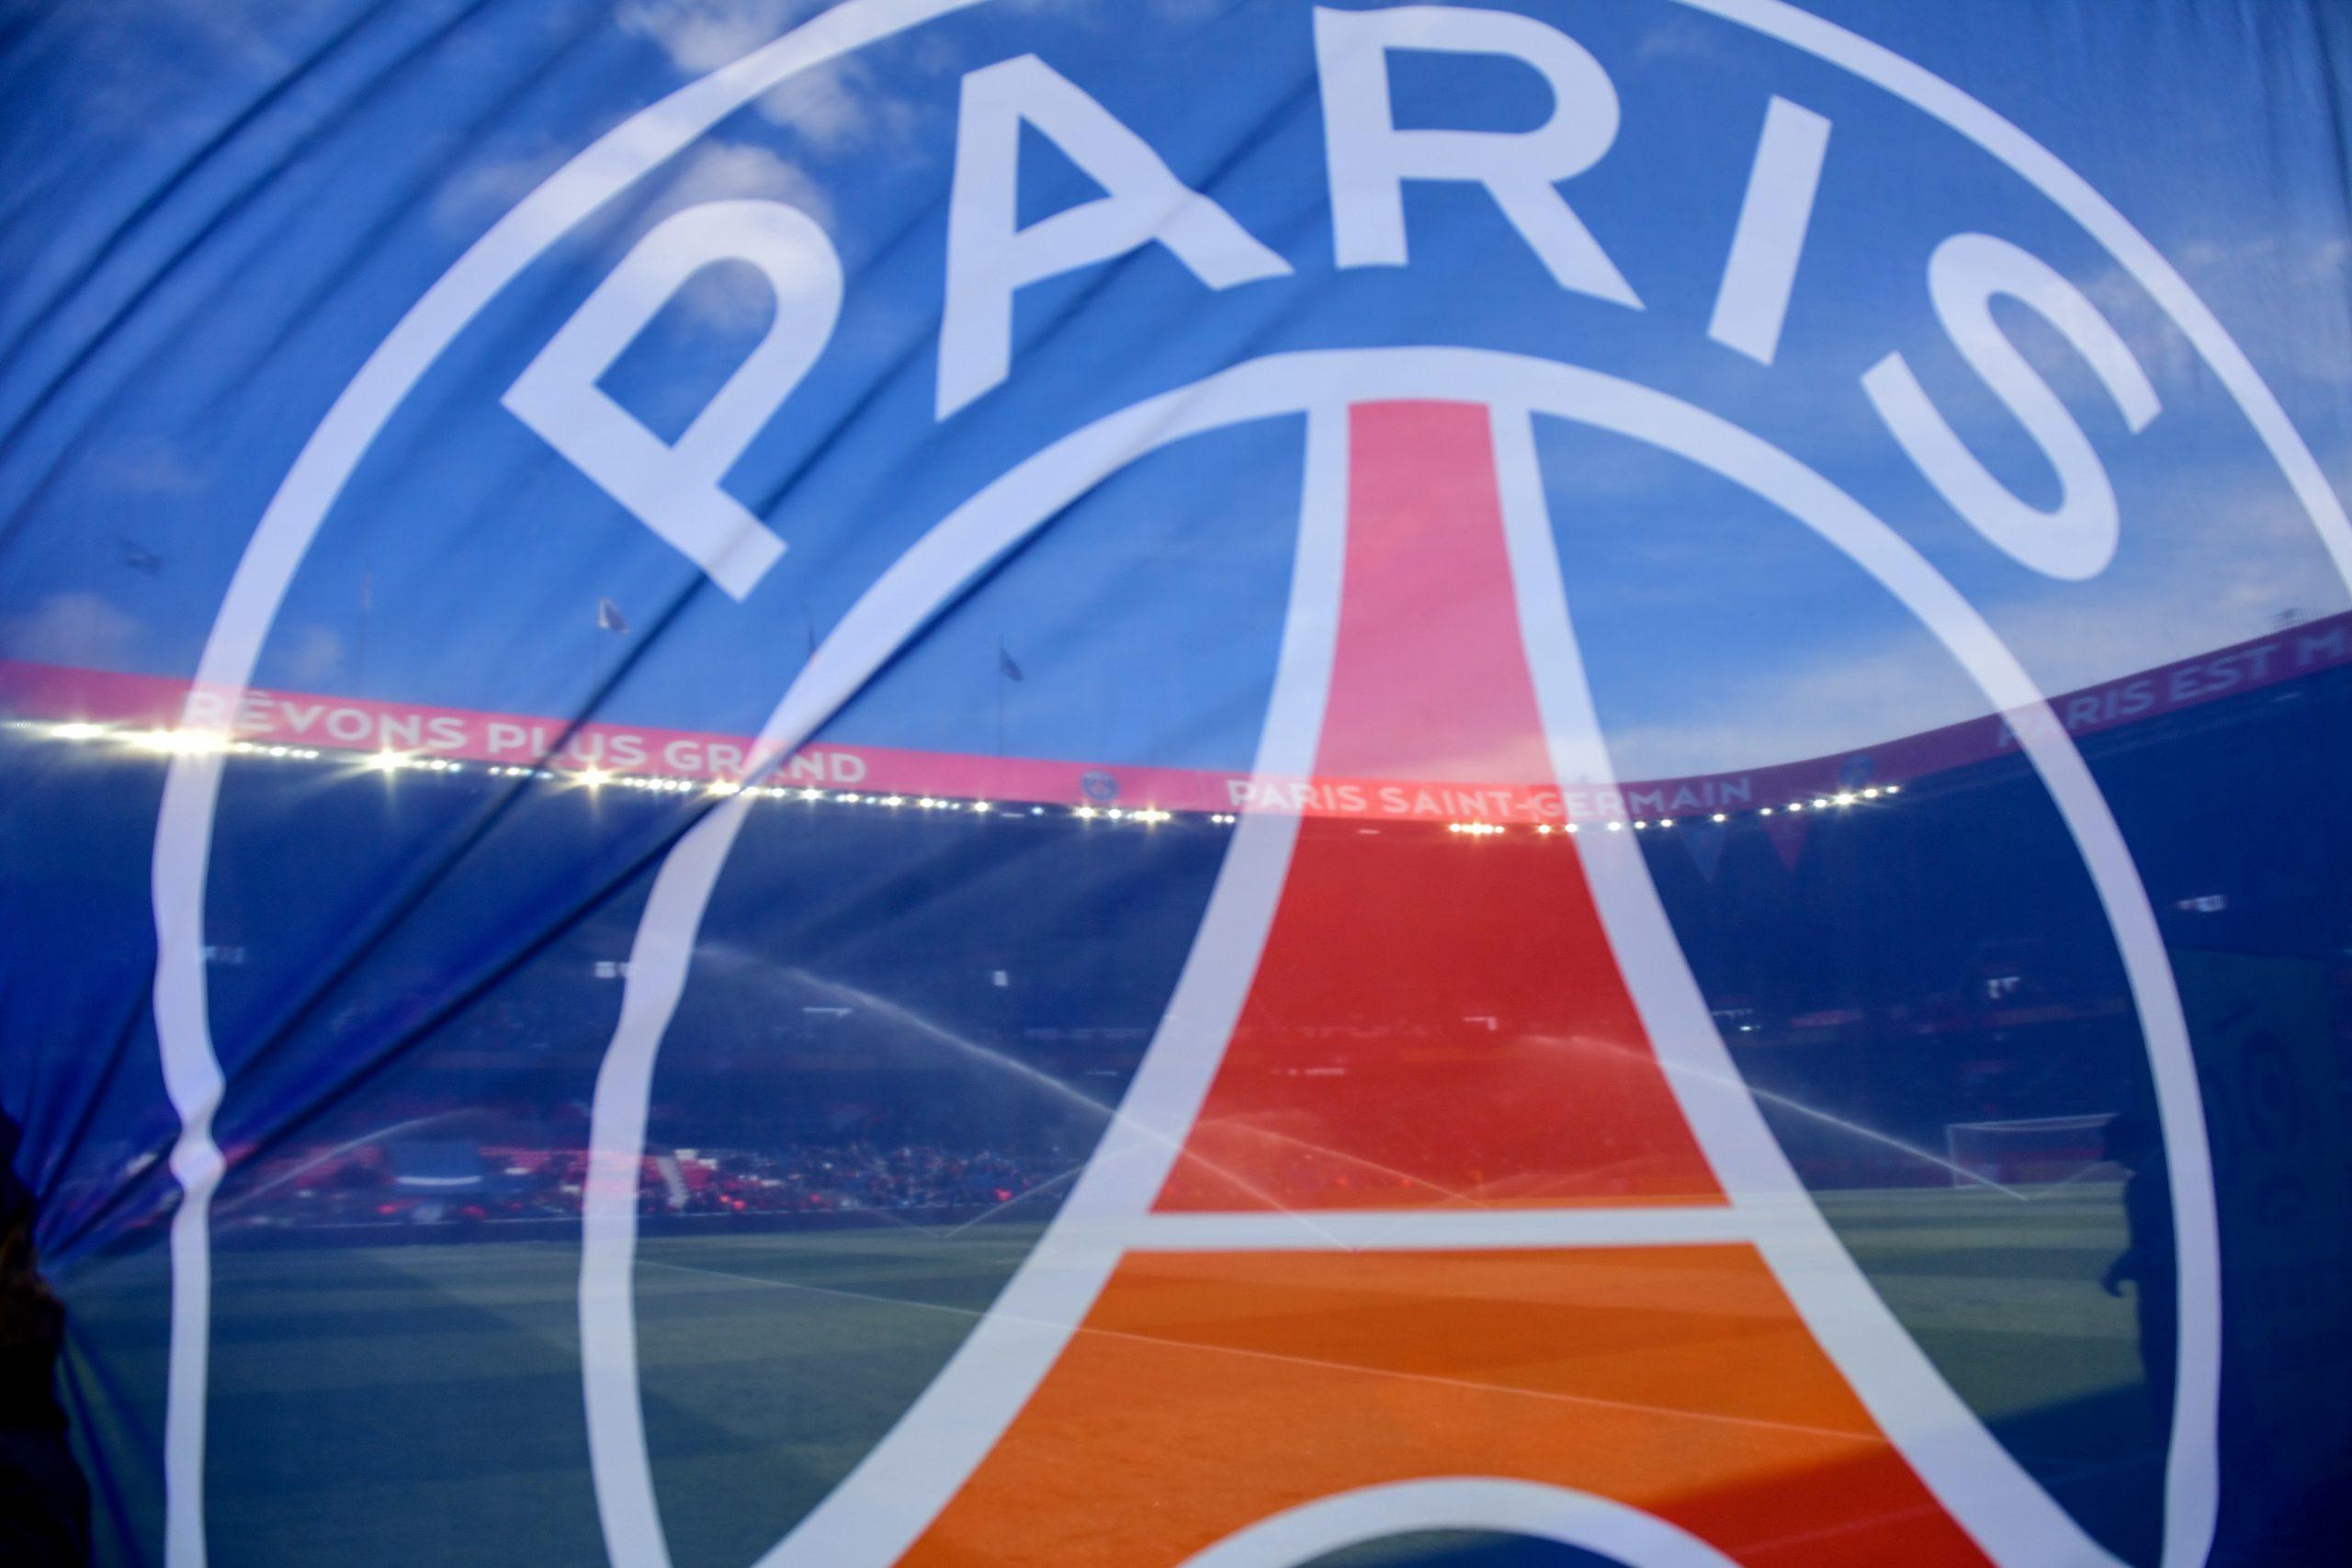 Noah Lemina va signer un contrat aspirant au PSG, annonce RMC Sport